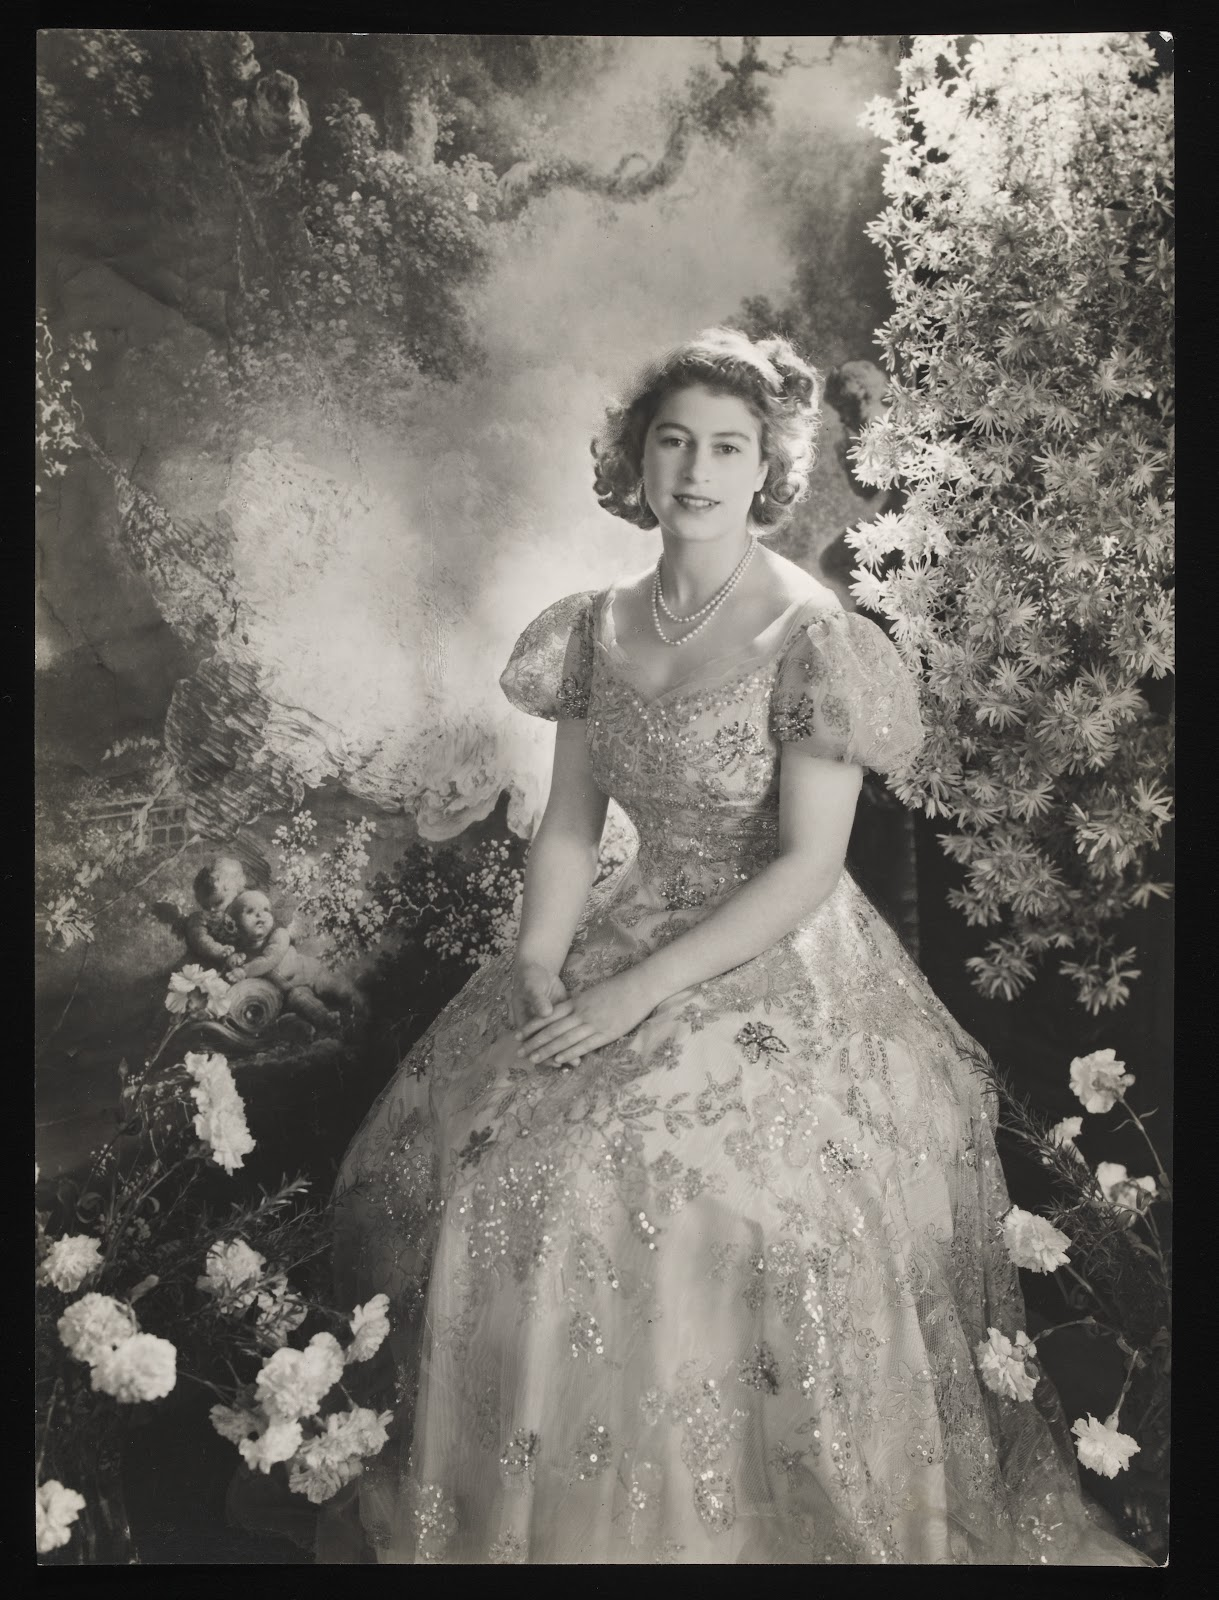 Cecil_Beaton_Princess_Elizabeth_at_Buckingham_Palace_March_1945.jpg